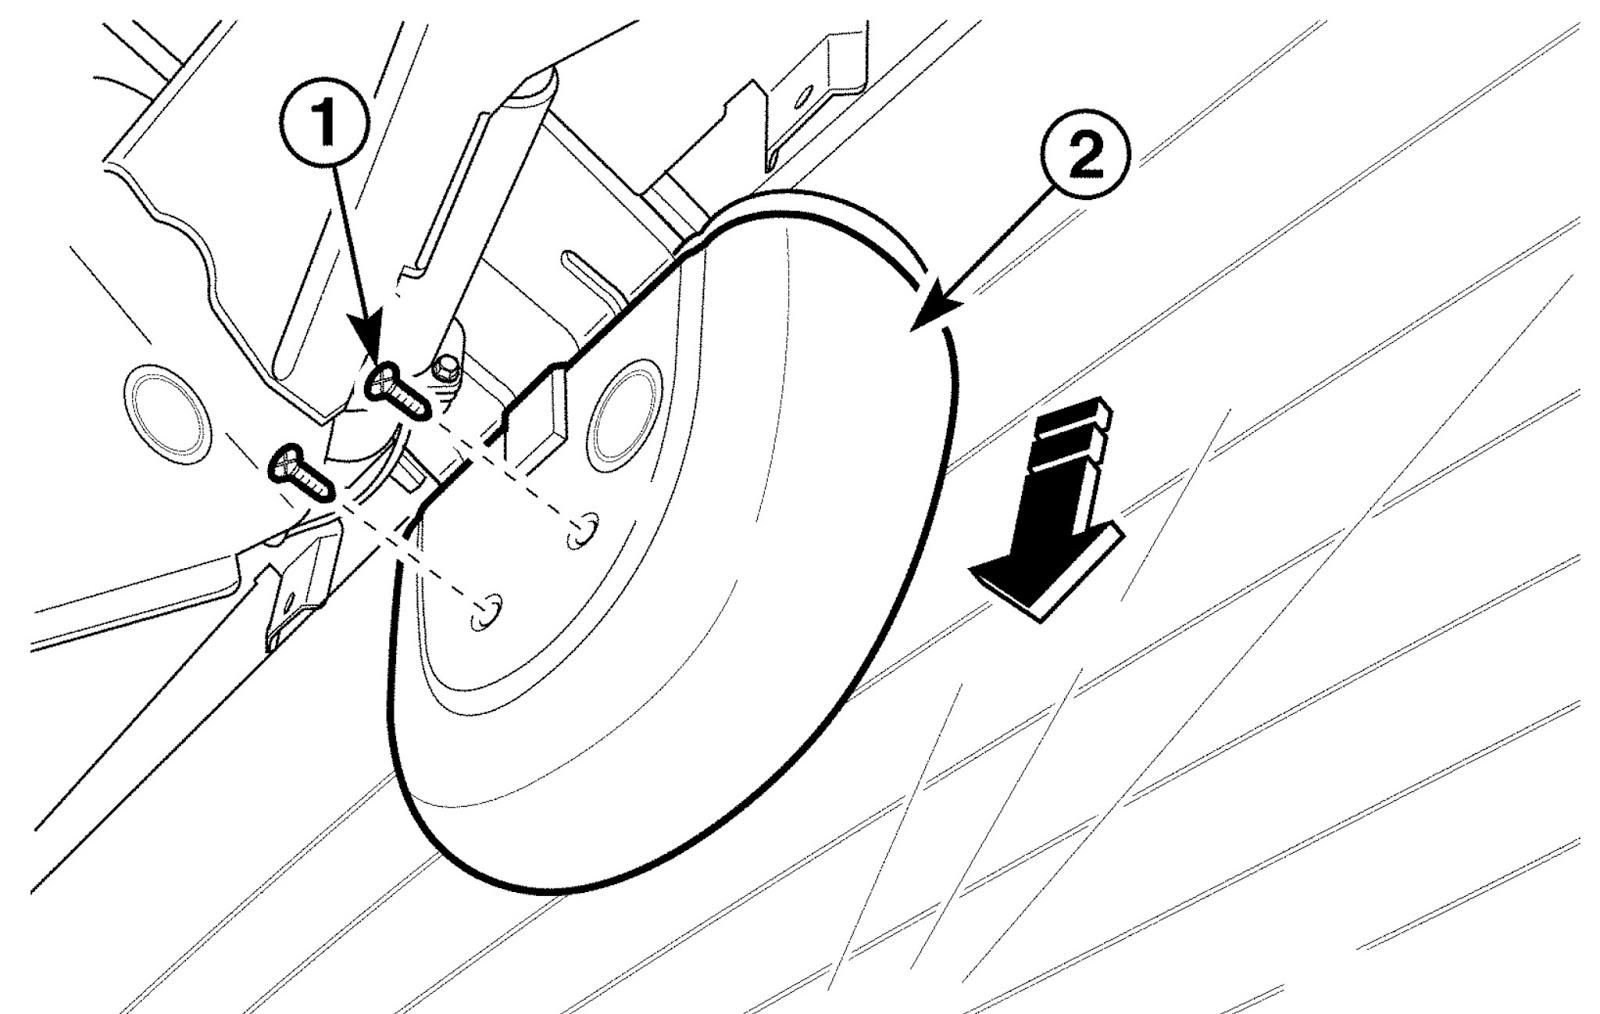 Sensational Daewoo Leganza Ignition Wiring Diagram Wiring Library Wiring Cloud Geisbieswglorg